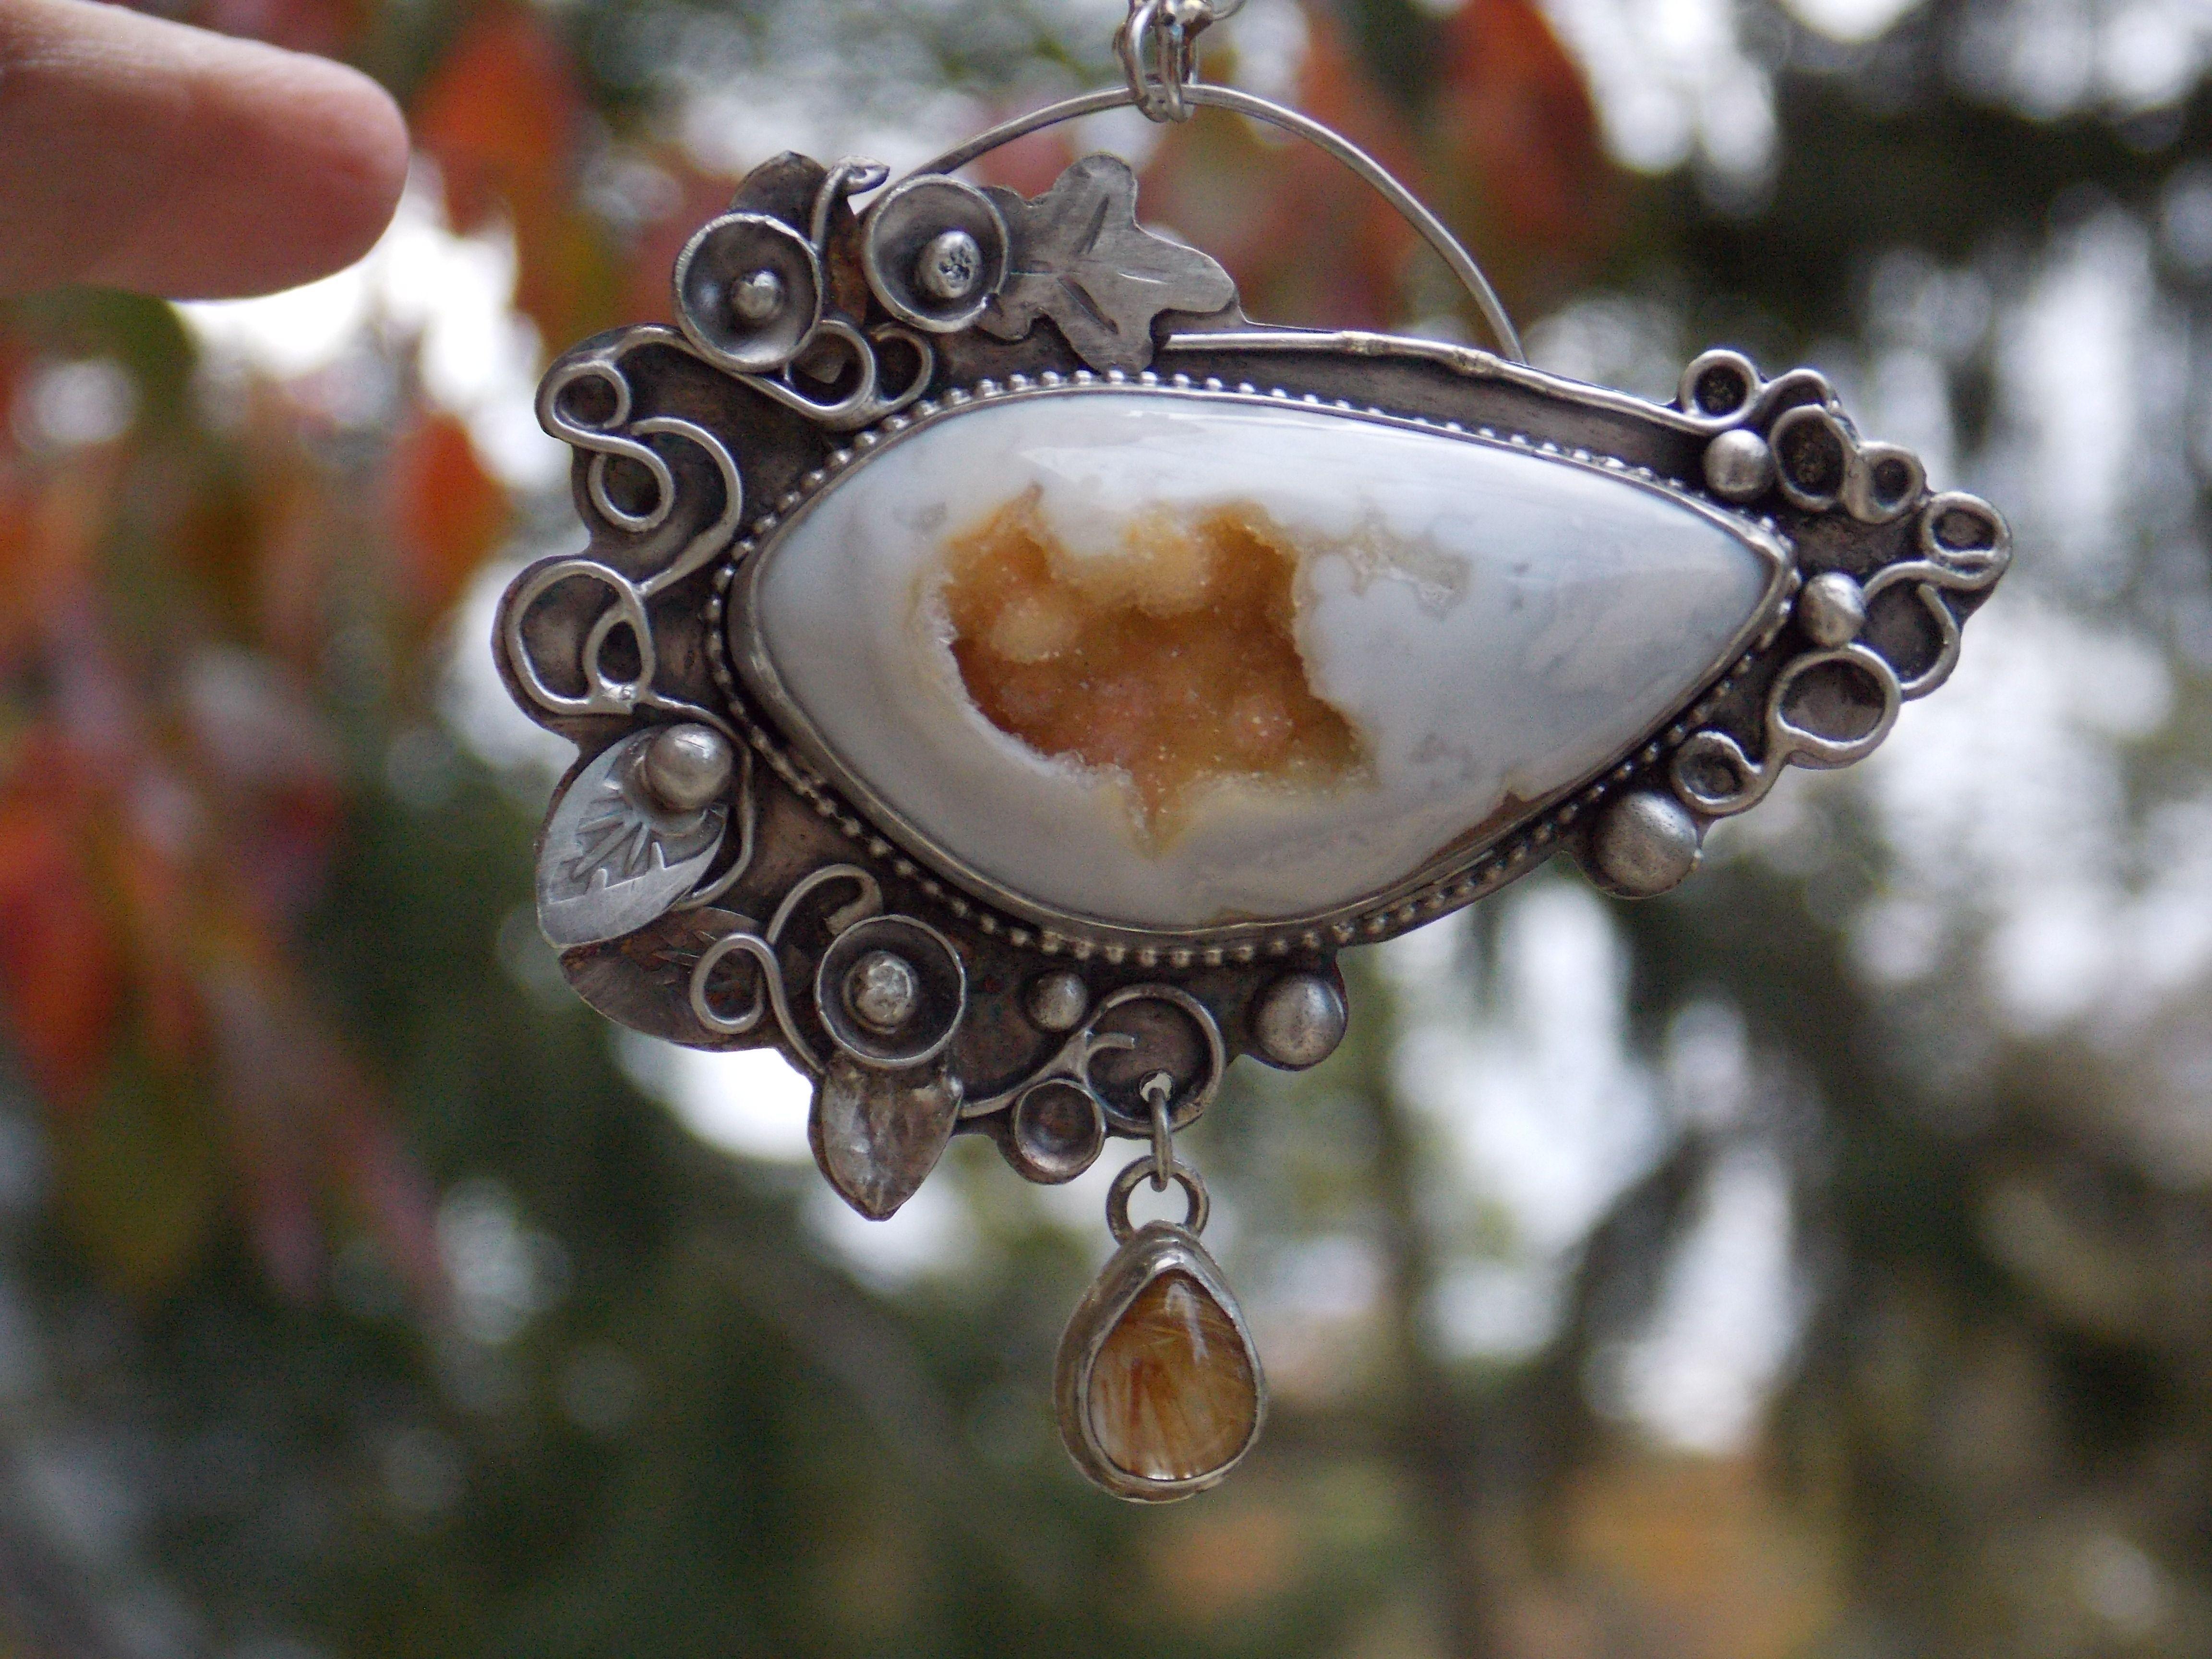 Artisan handmade OOAk sterling silver large natural stone Druzy jewelry sterling druzy pendant golden Rulite gemstone jewelry metalwork jewelry metal art jewelry metal smith jewelry artisan sterling jewerly